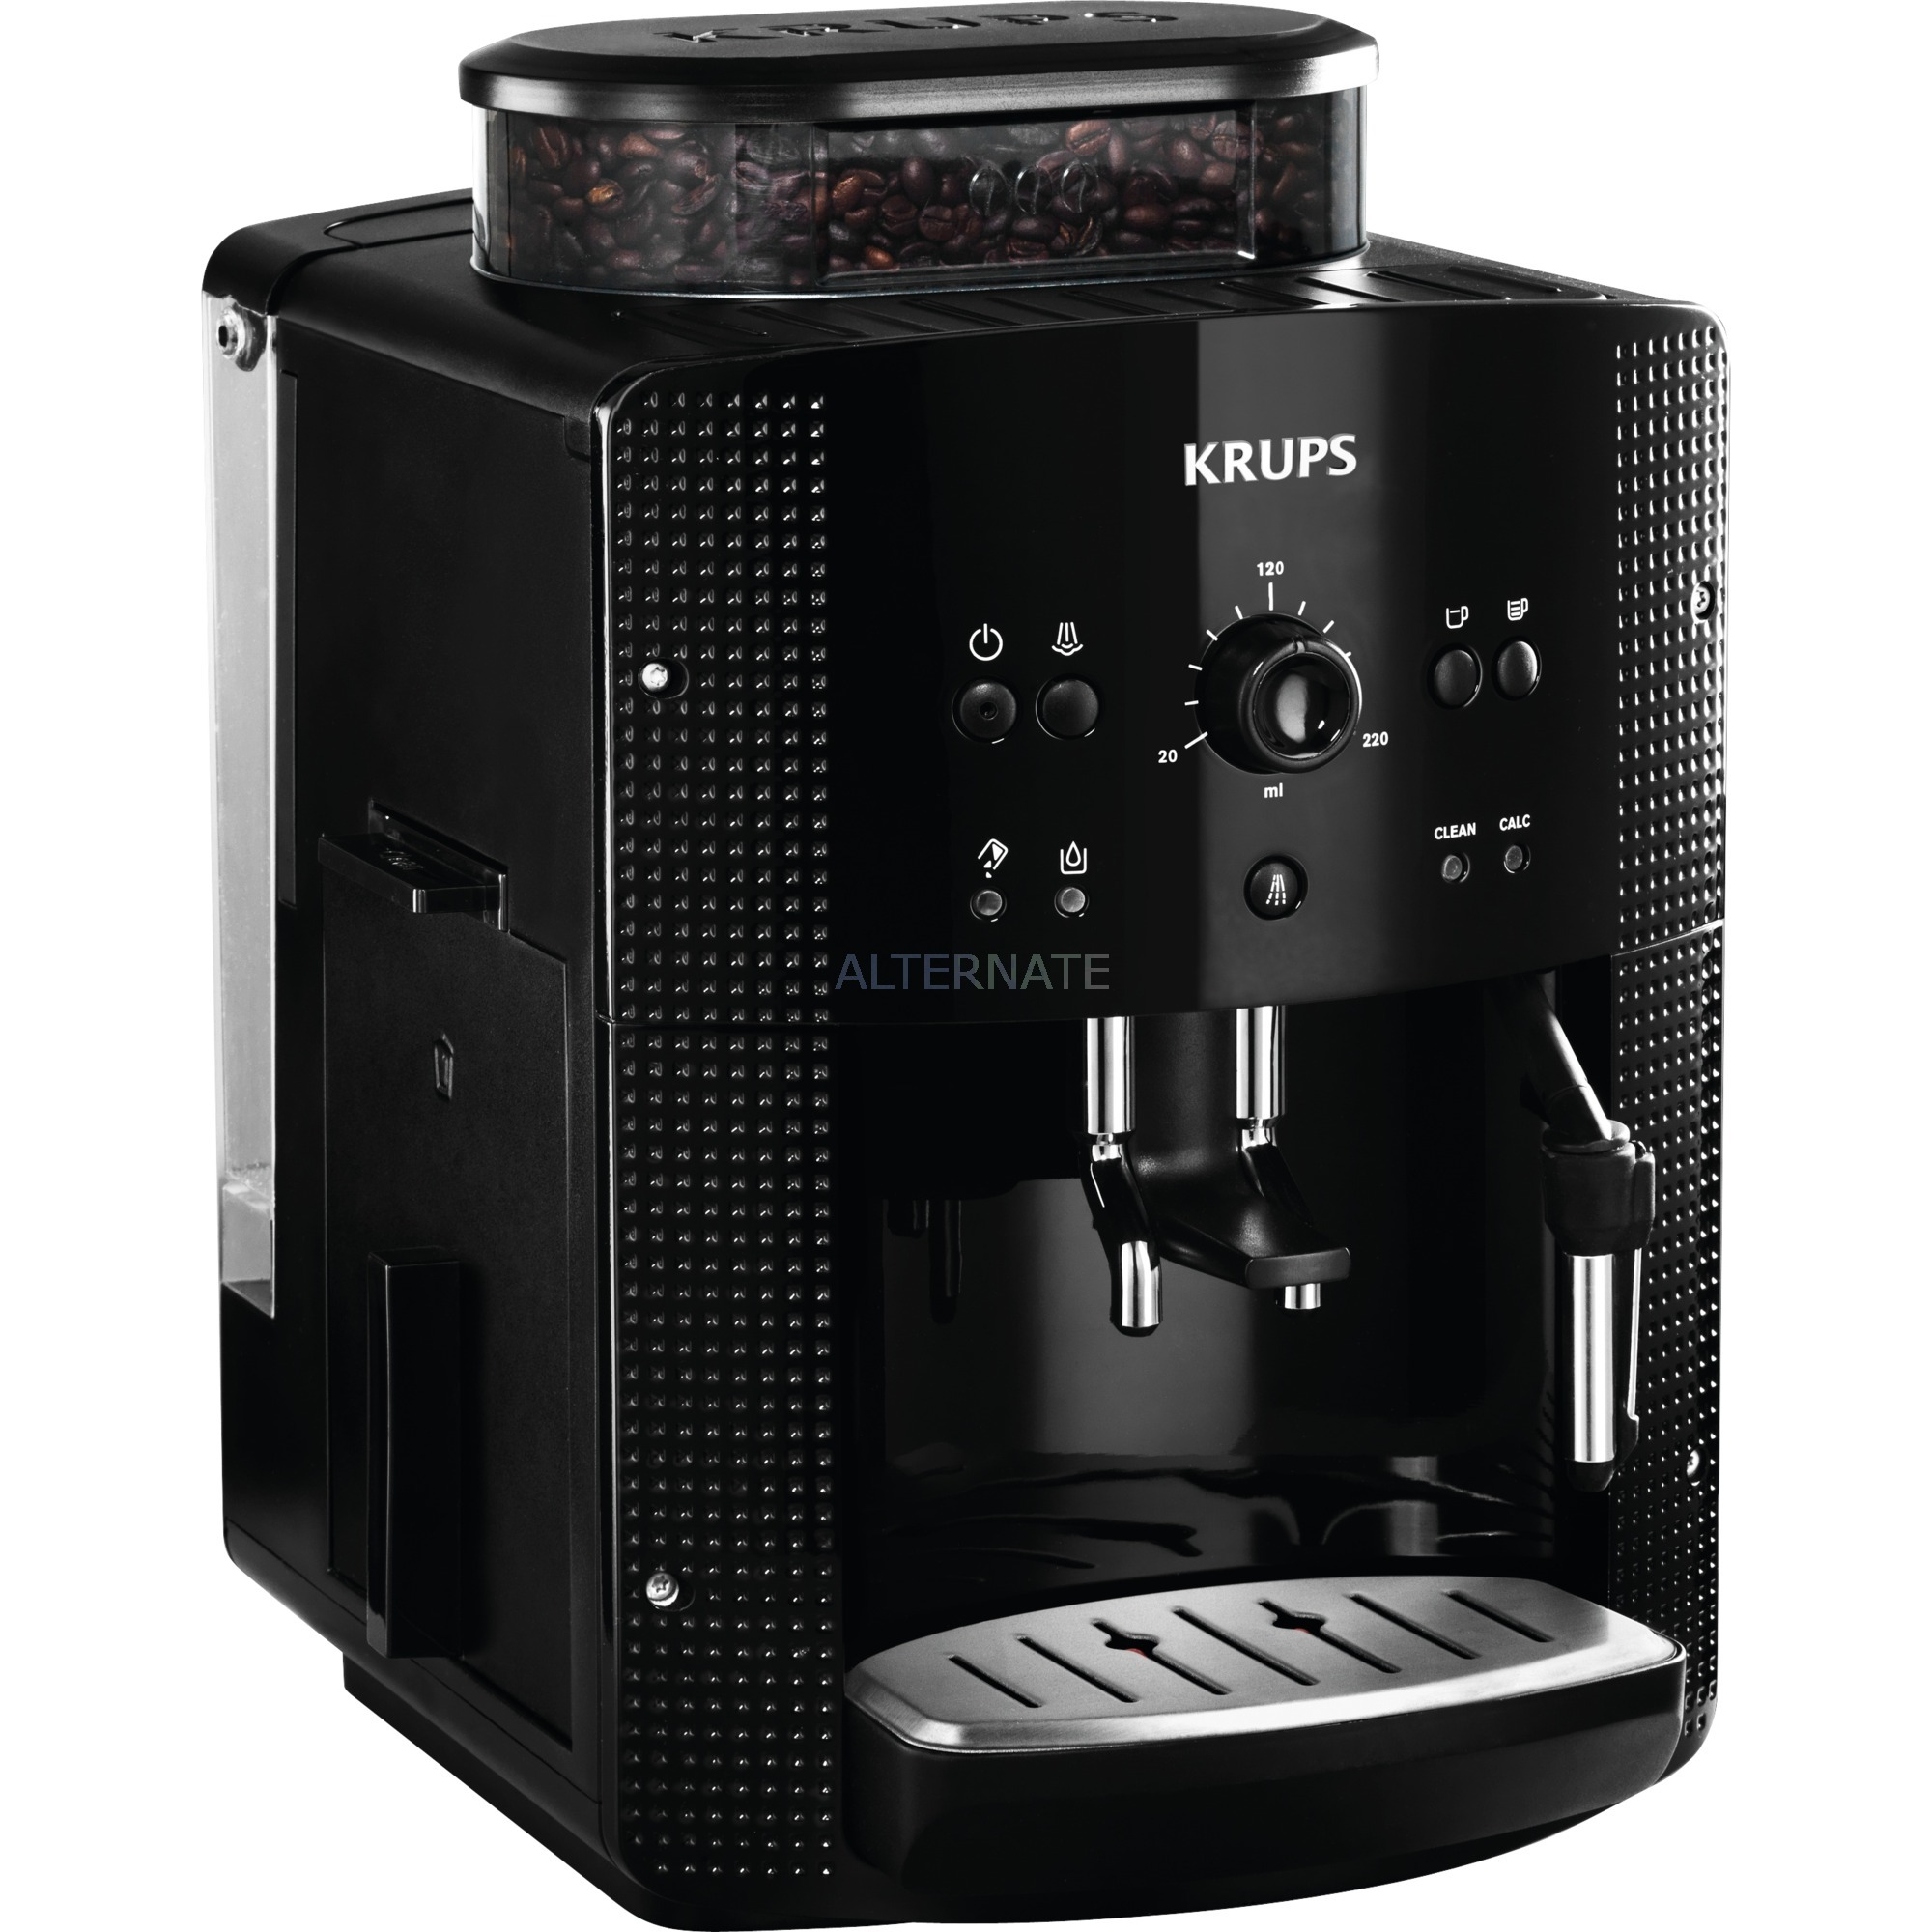 EA8108 cafetera eléctrica Encimera Máquina espresso 1,8 L Totalmente automática, Superautomática